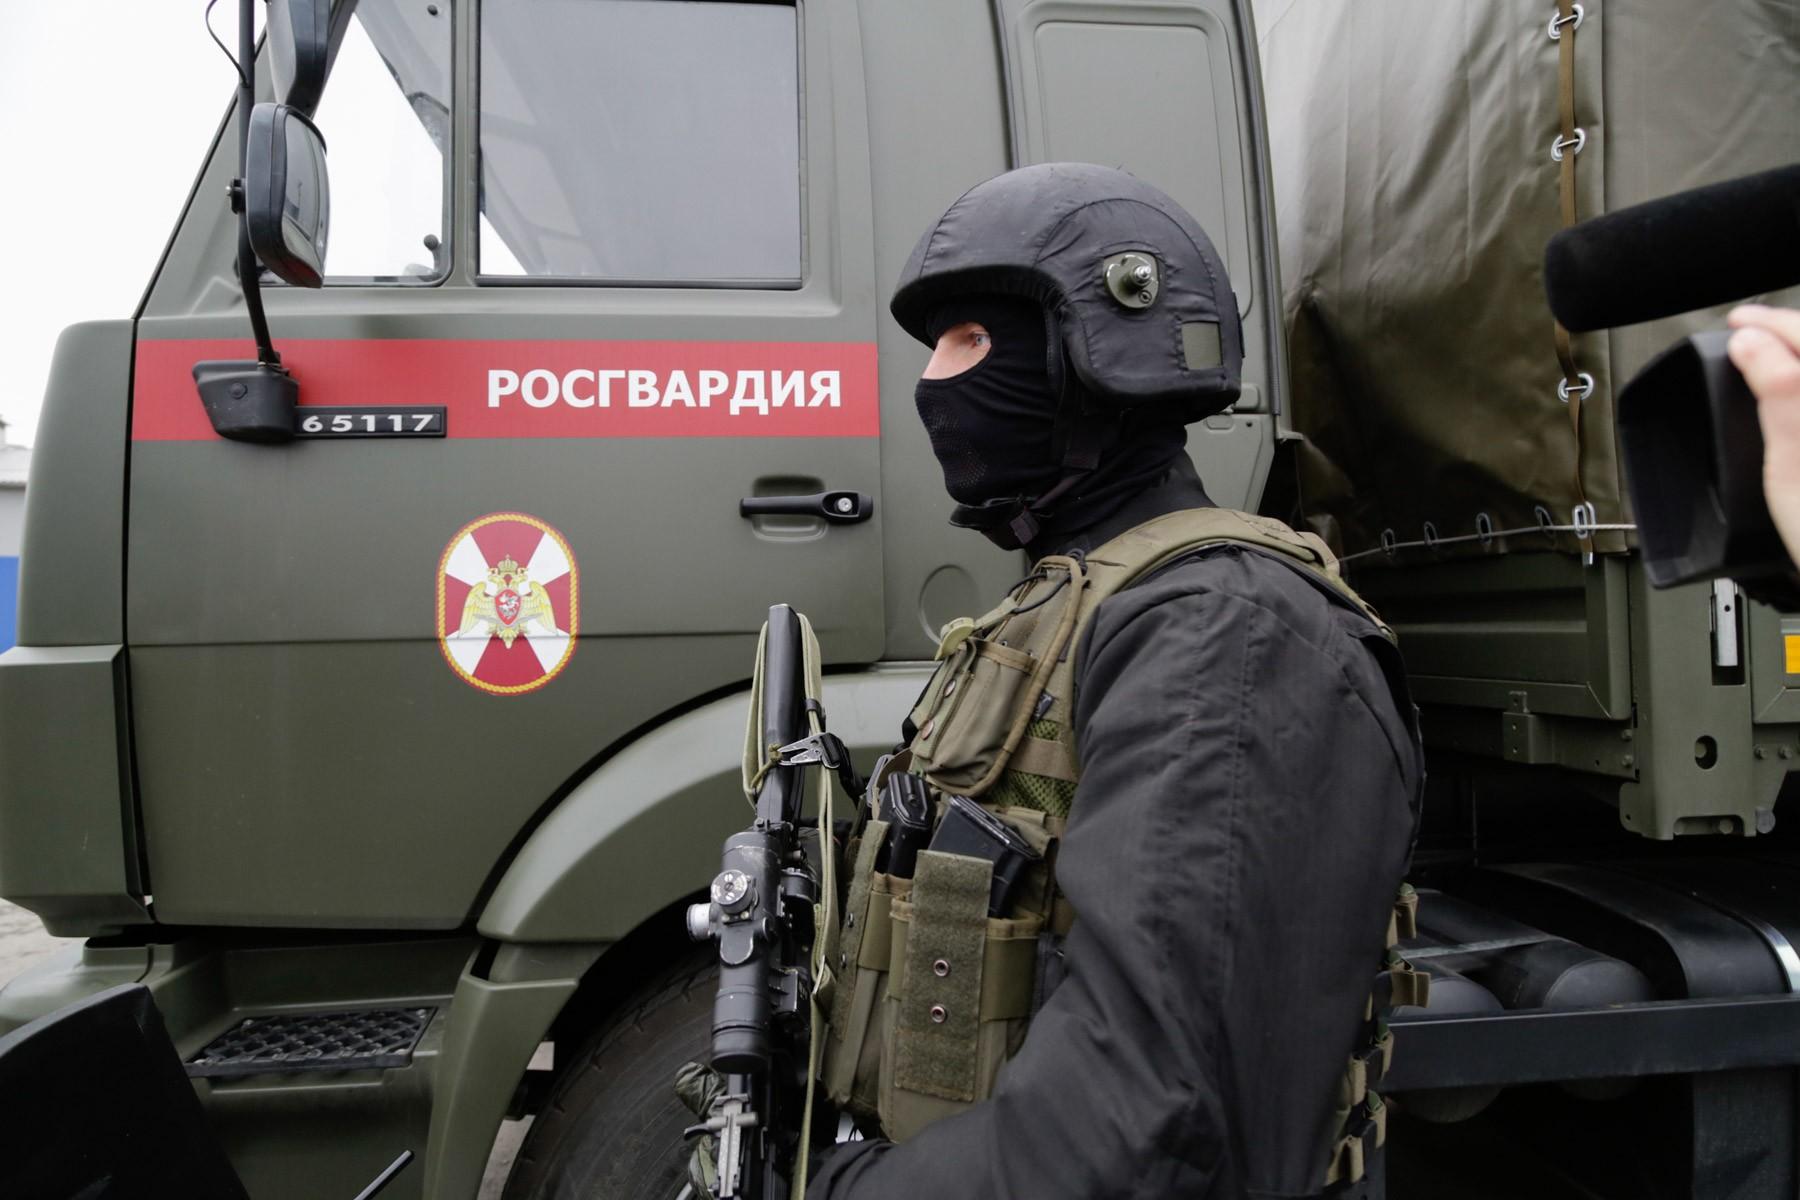 ВЕкатеринбурге накорпоративе Роспотребнадзора задержали служащих ведомства